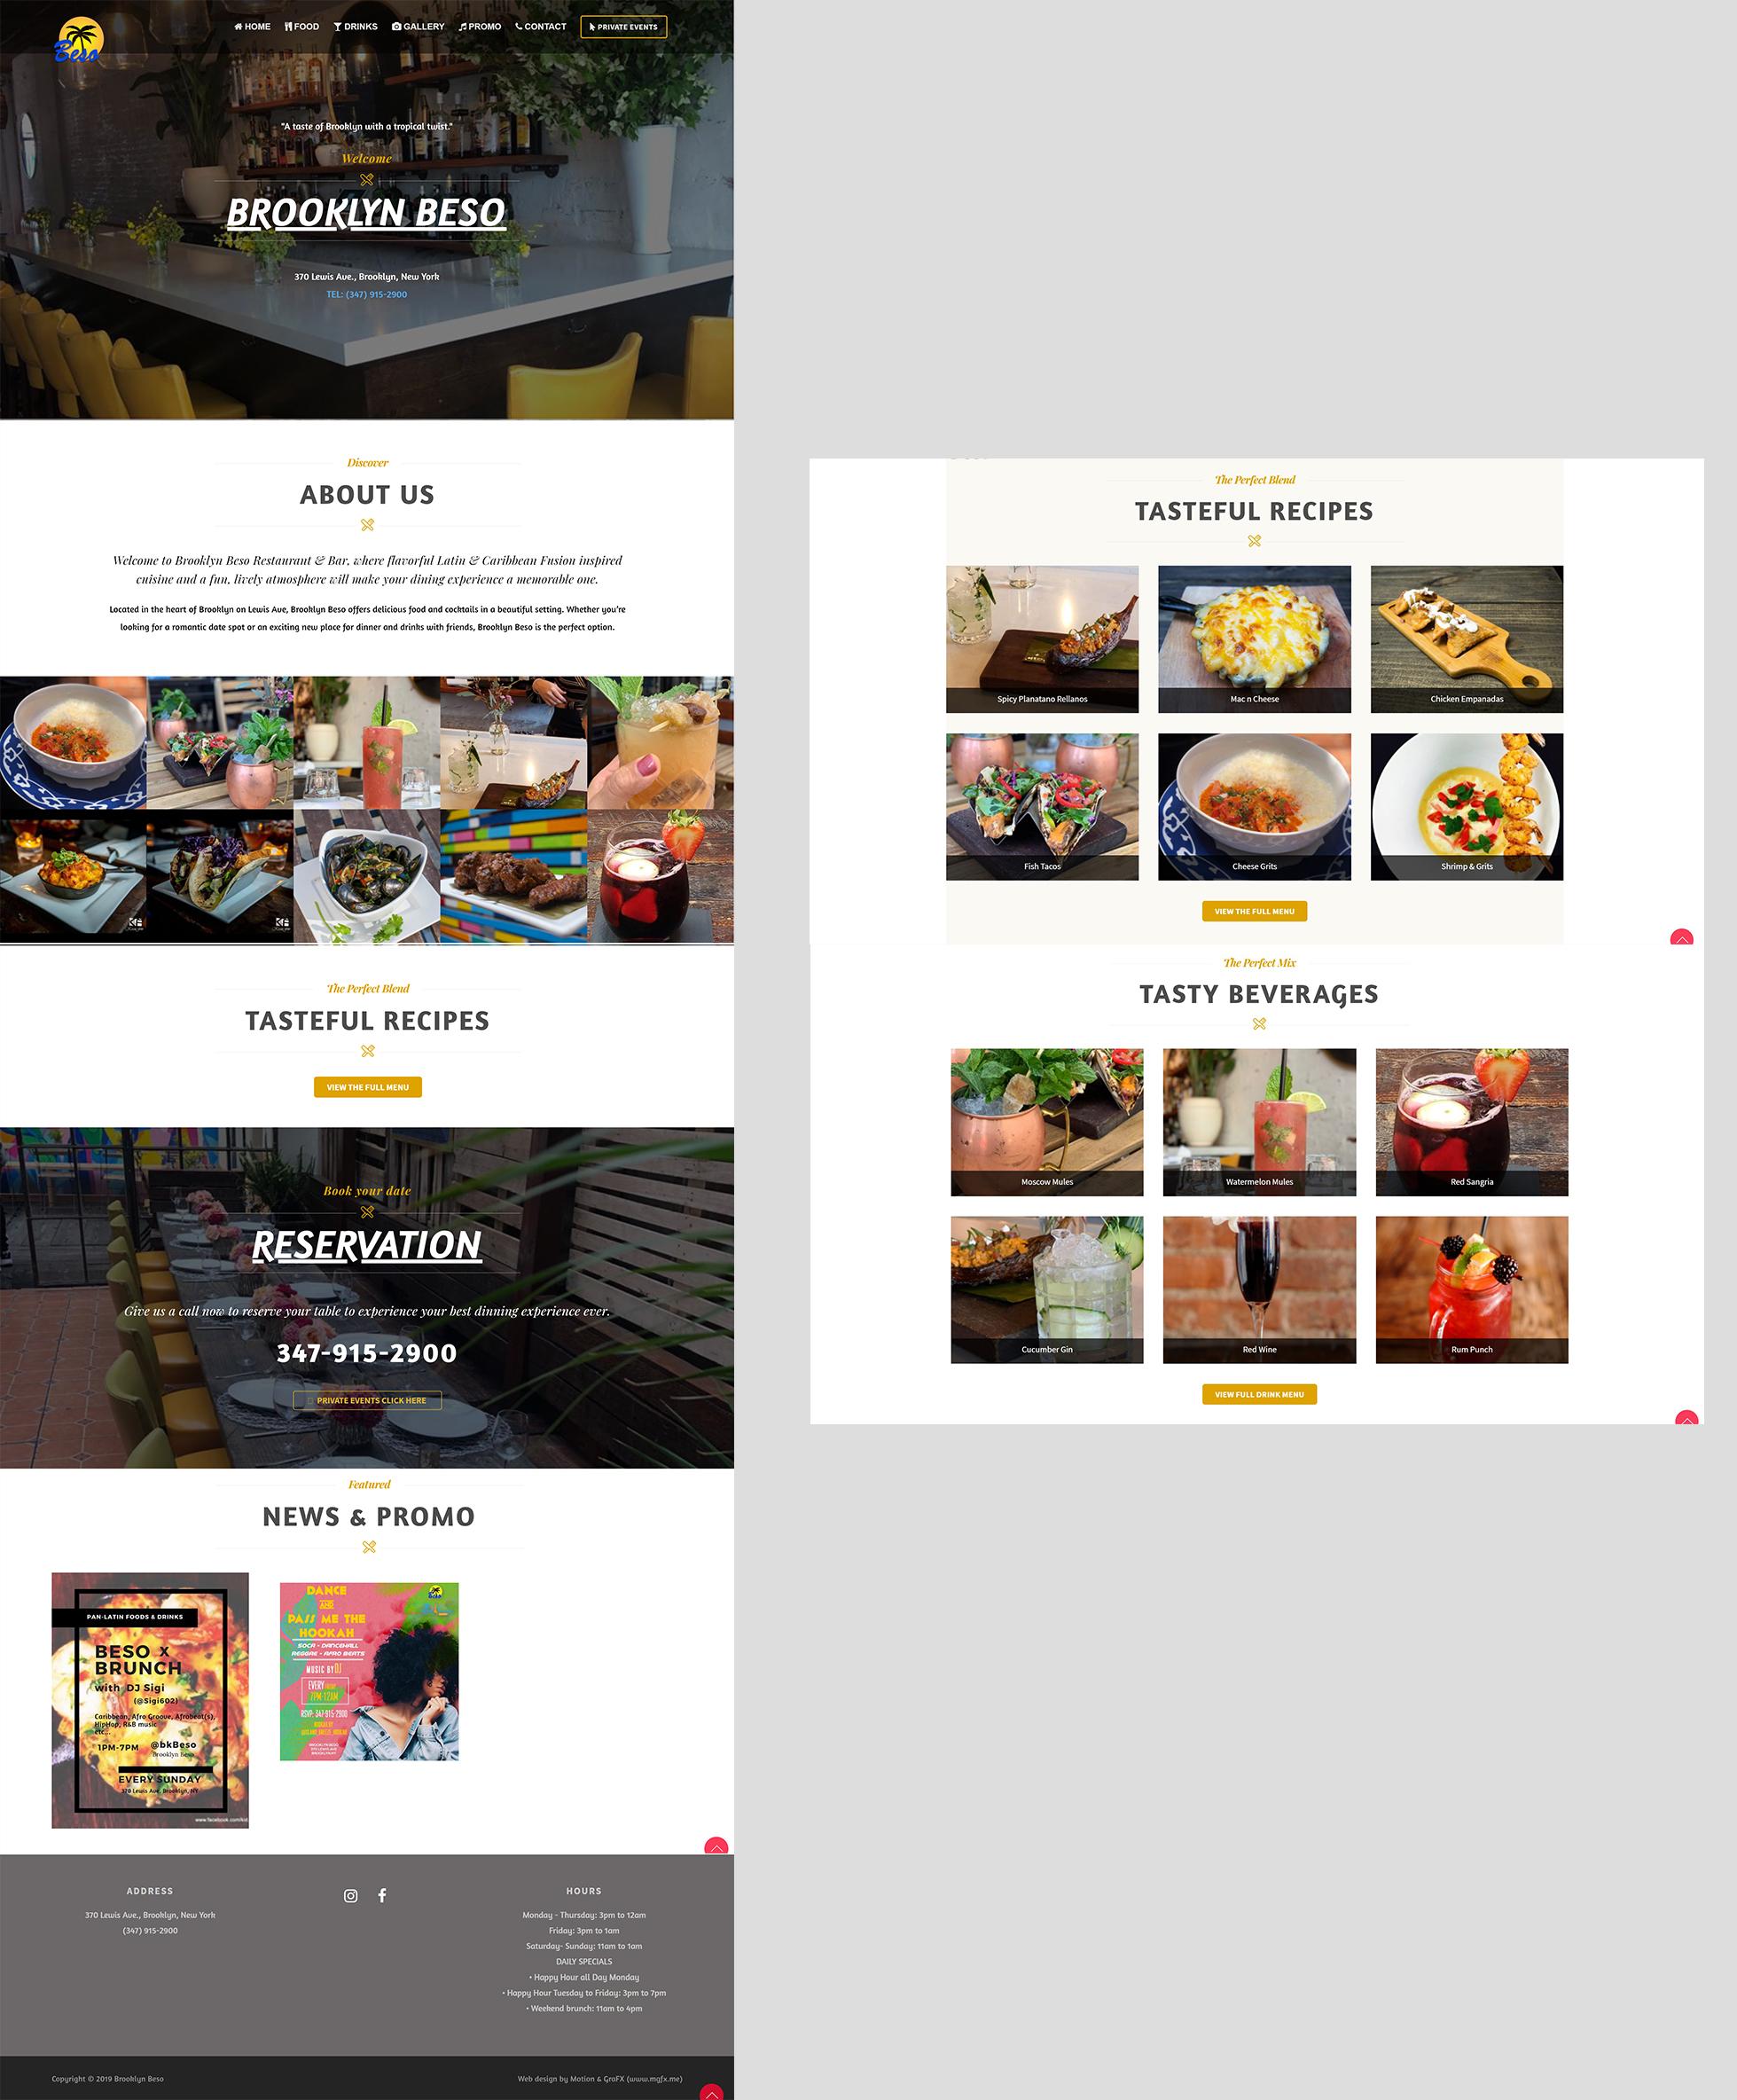 BK Beso Website